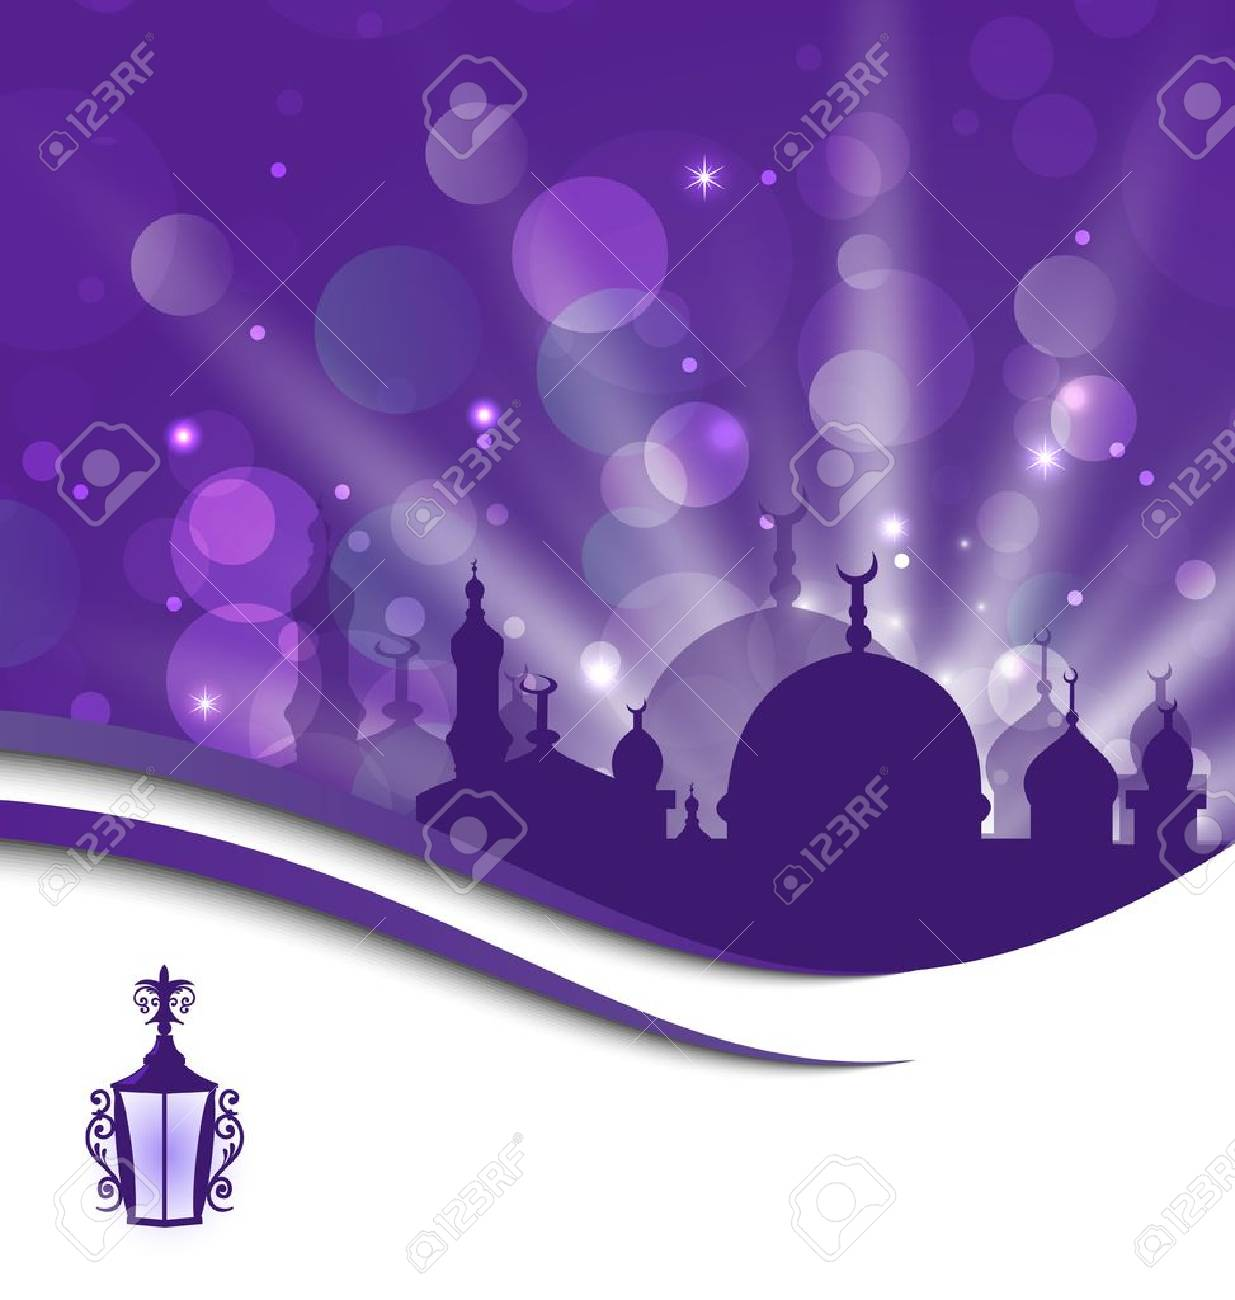 Illustration greeting card template for Ramadan Kareem - 20620217